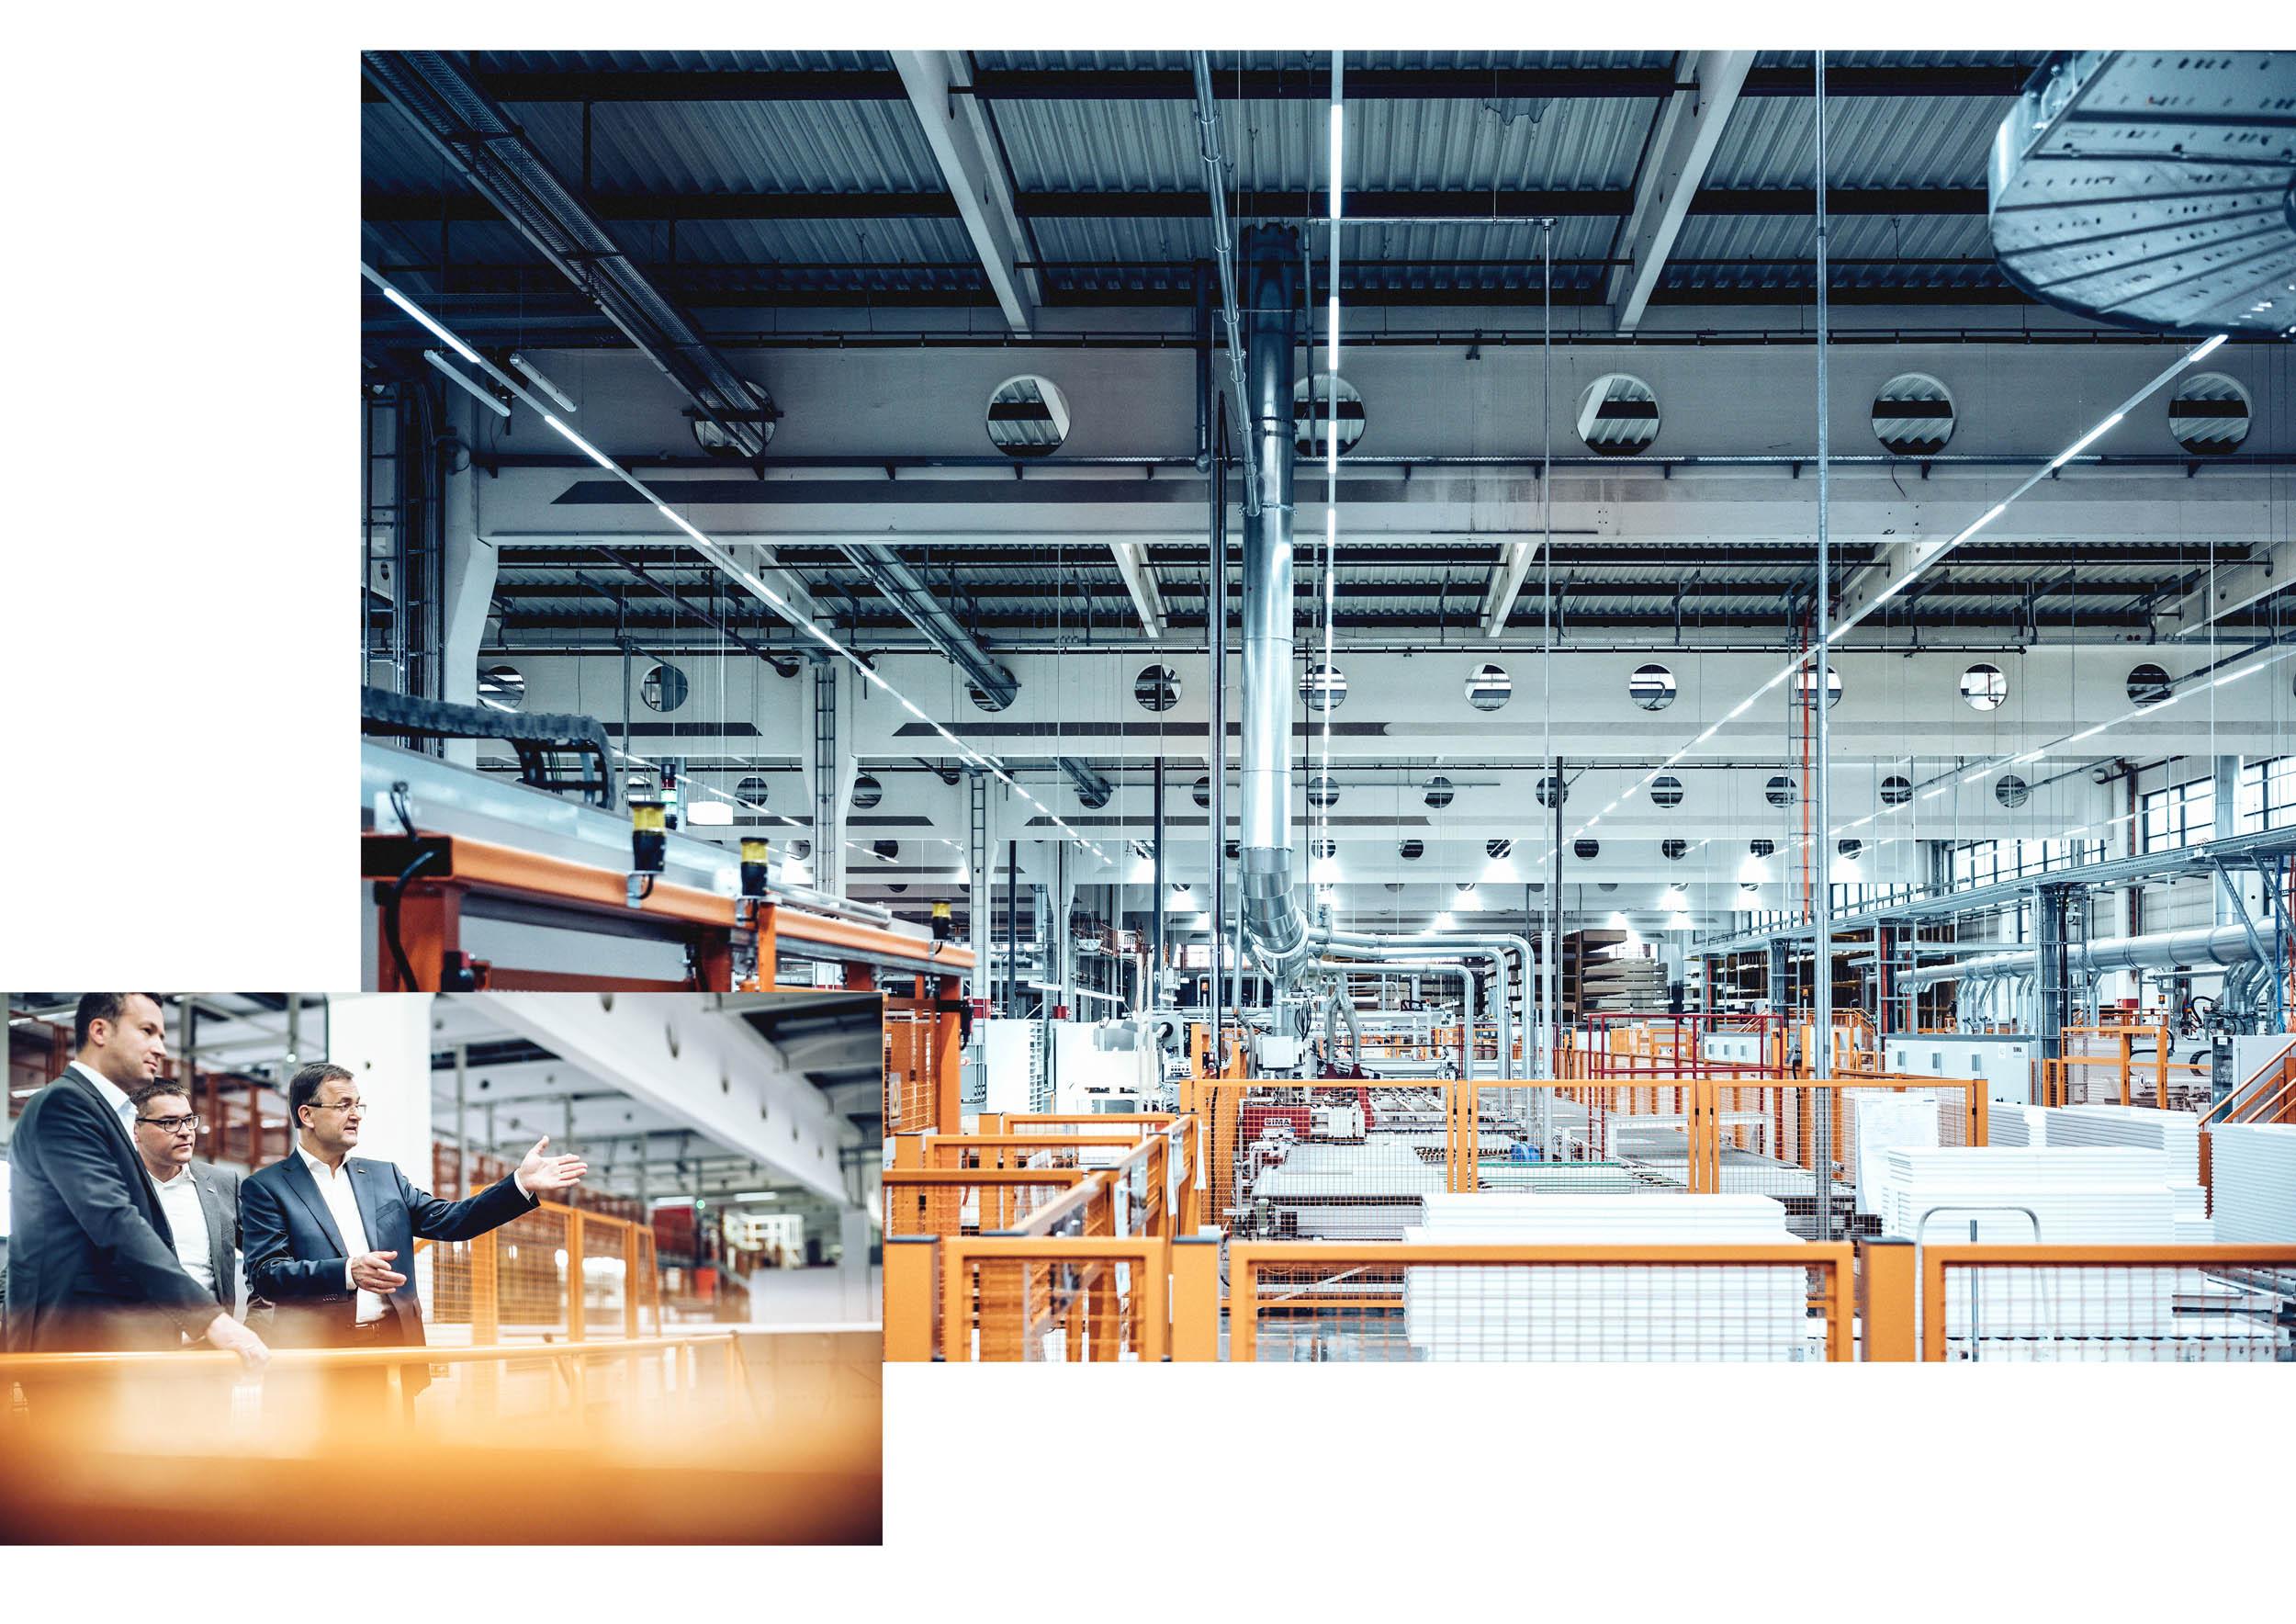 2018_SeifertUebler_schueller_kuechen_corporate_portrait_industrial_photography_010.jpg